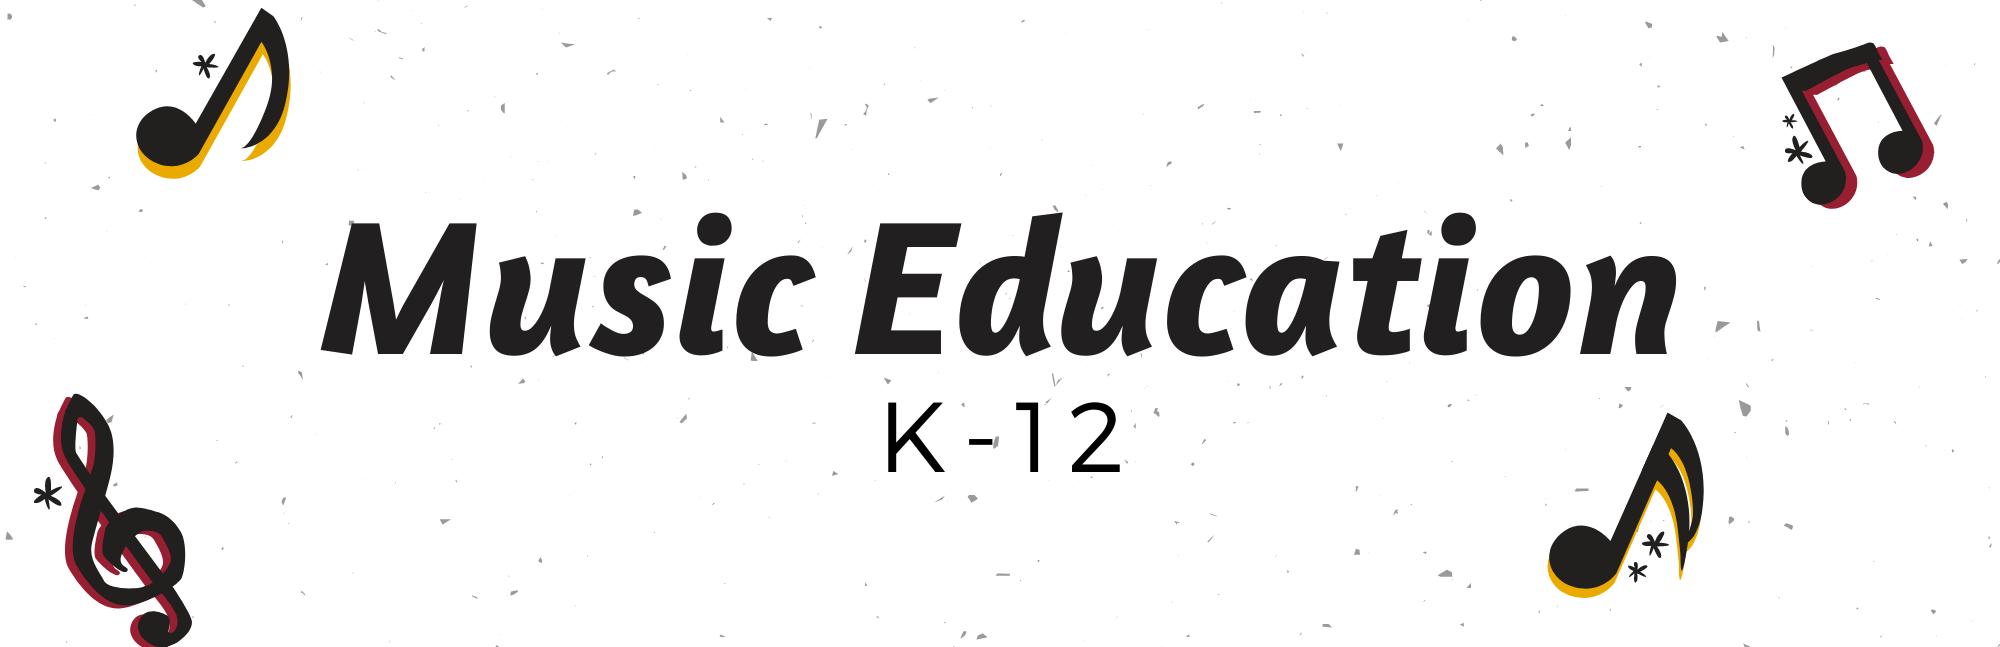 Music Education K-12